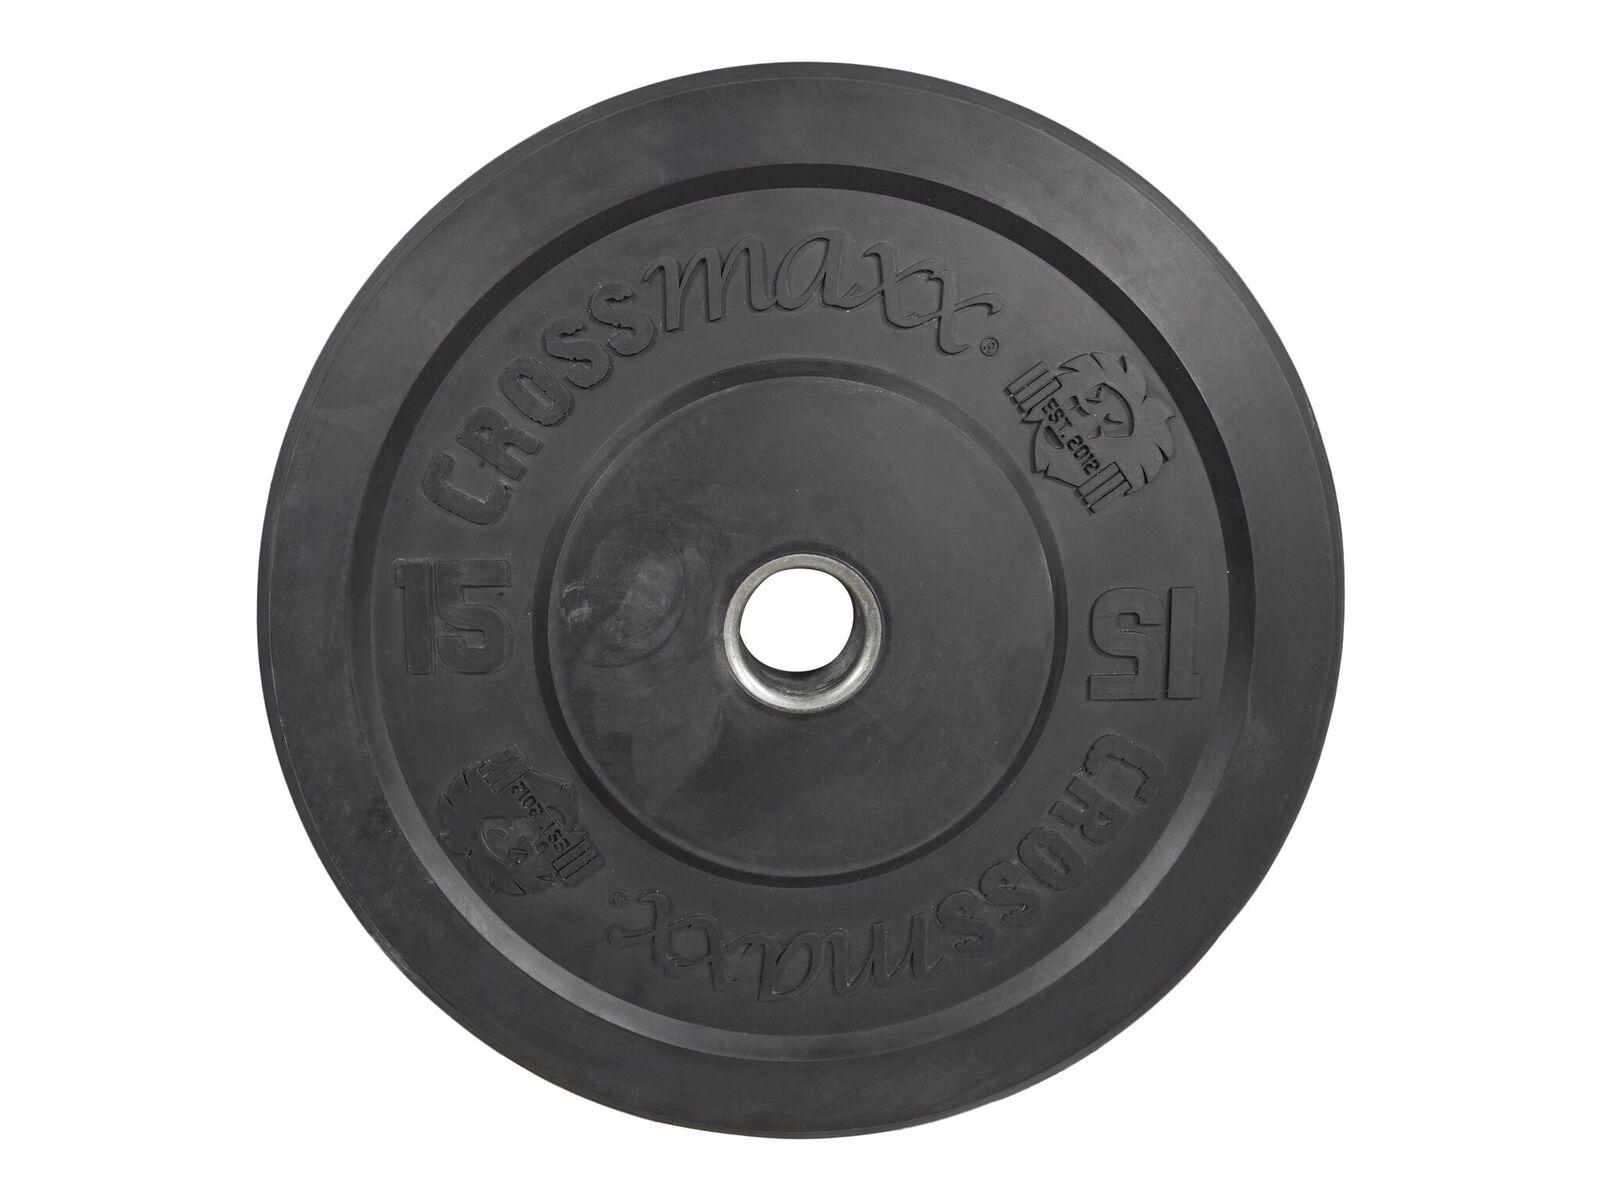 Crossmaxx Bumper Plate 15 kg